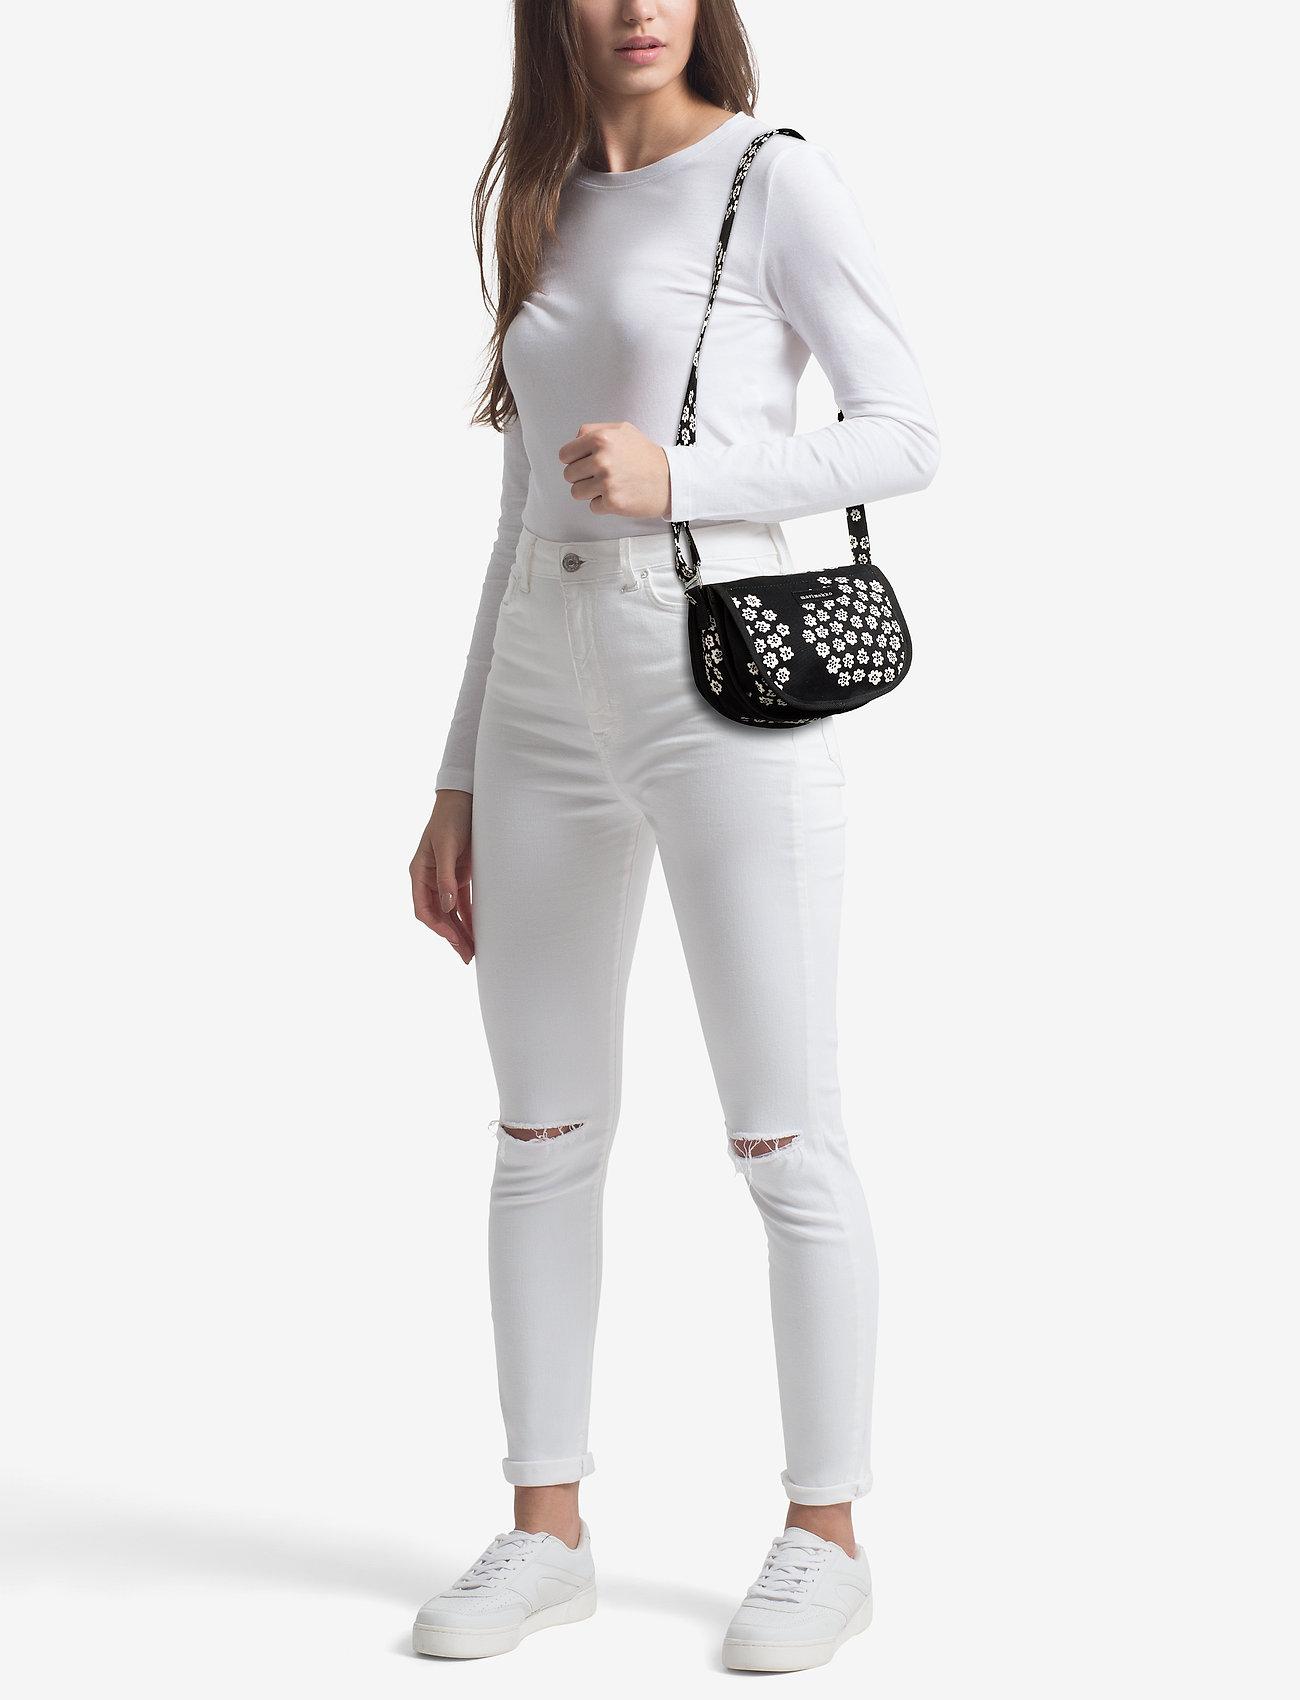 Marimekko FIDELMA PUKETTI Shoulder-bag - BLACK,WHITE,BLACK